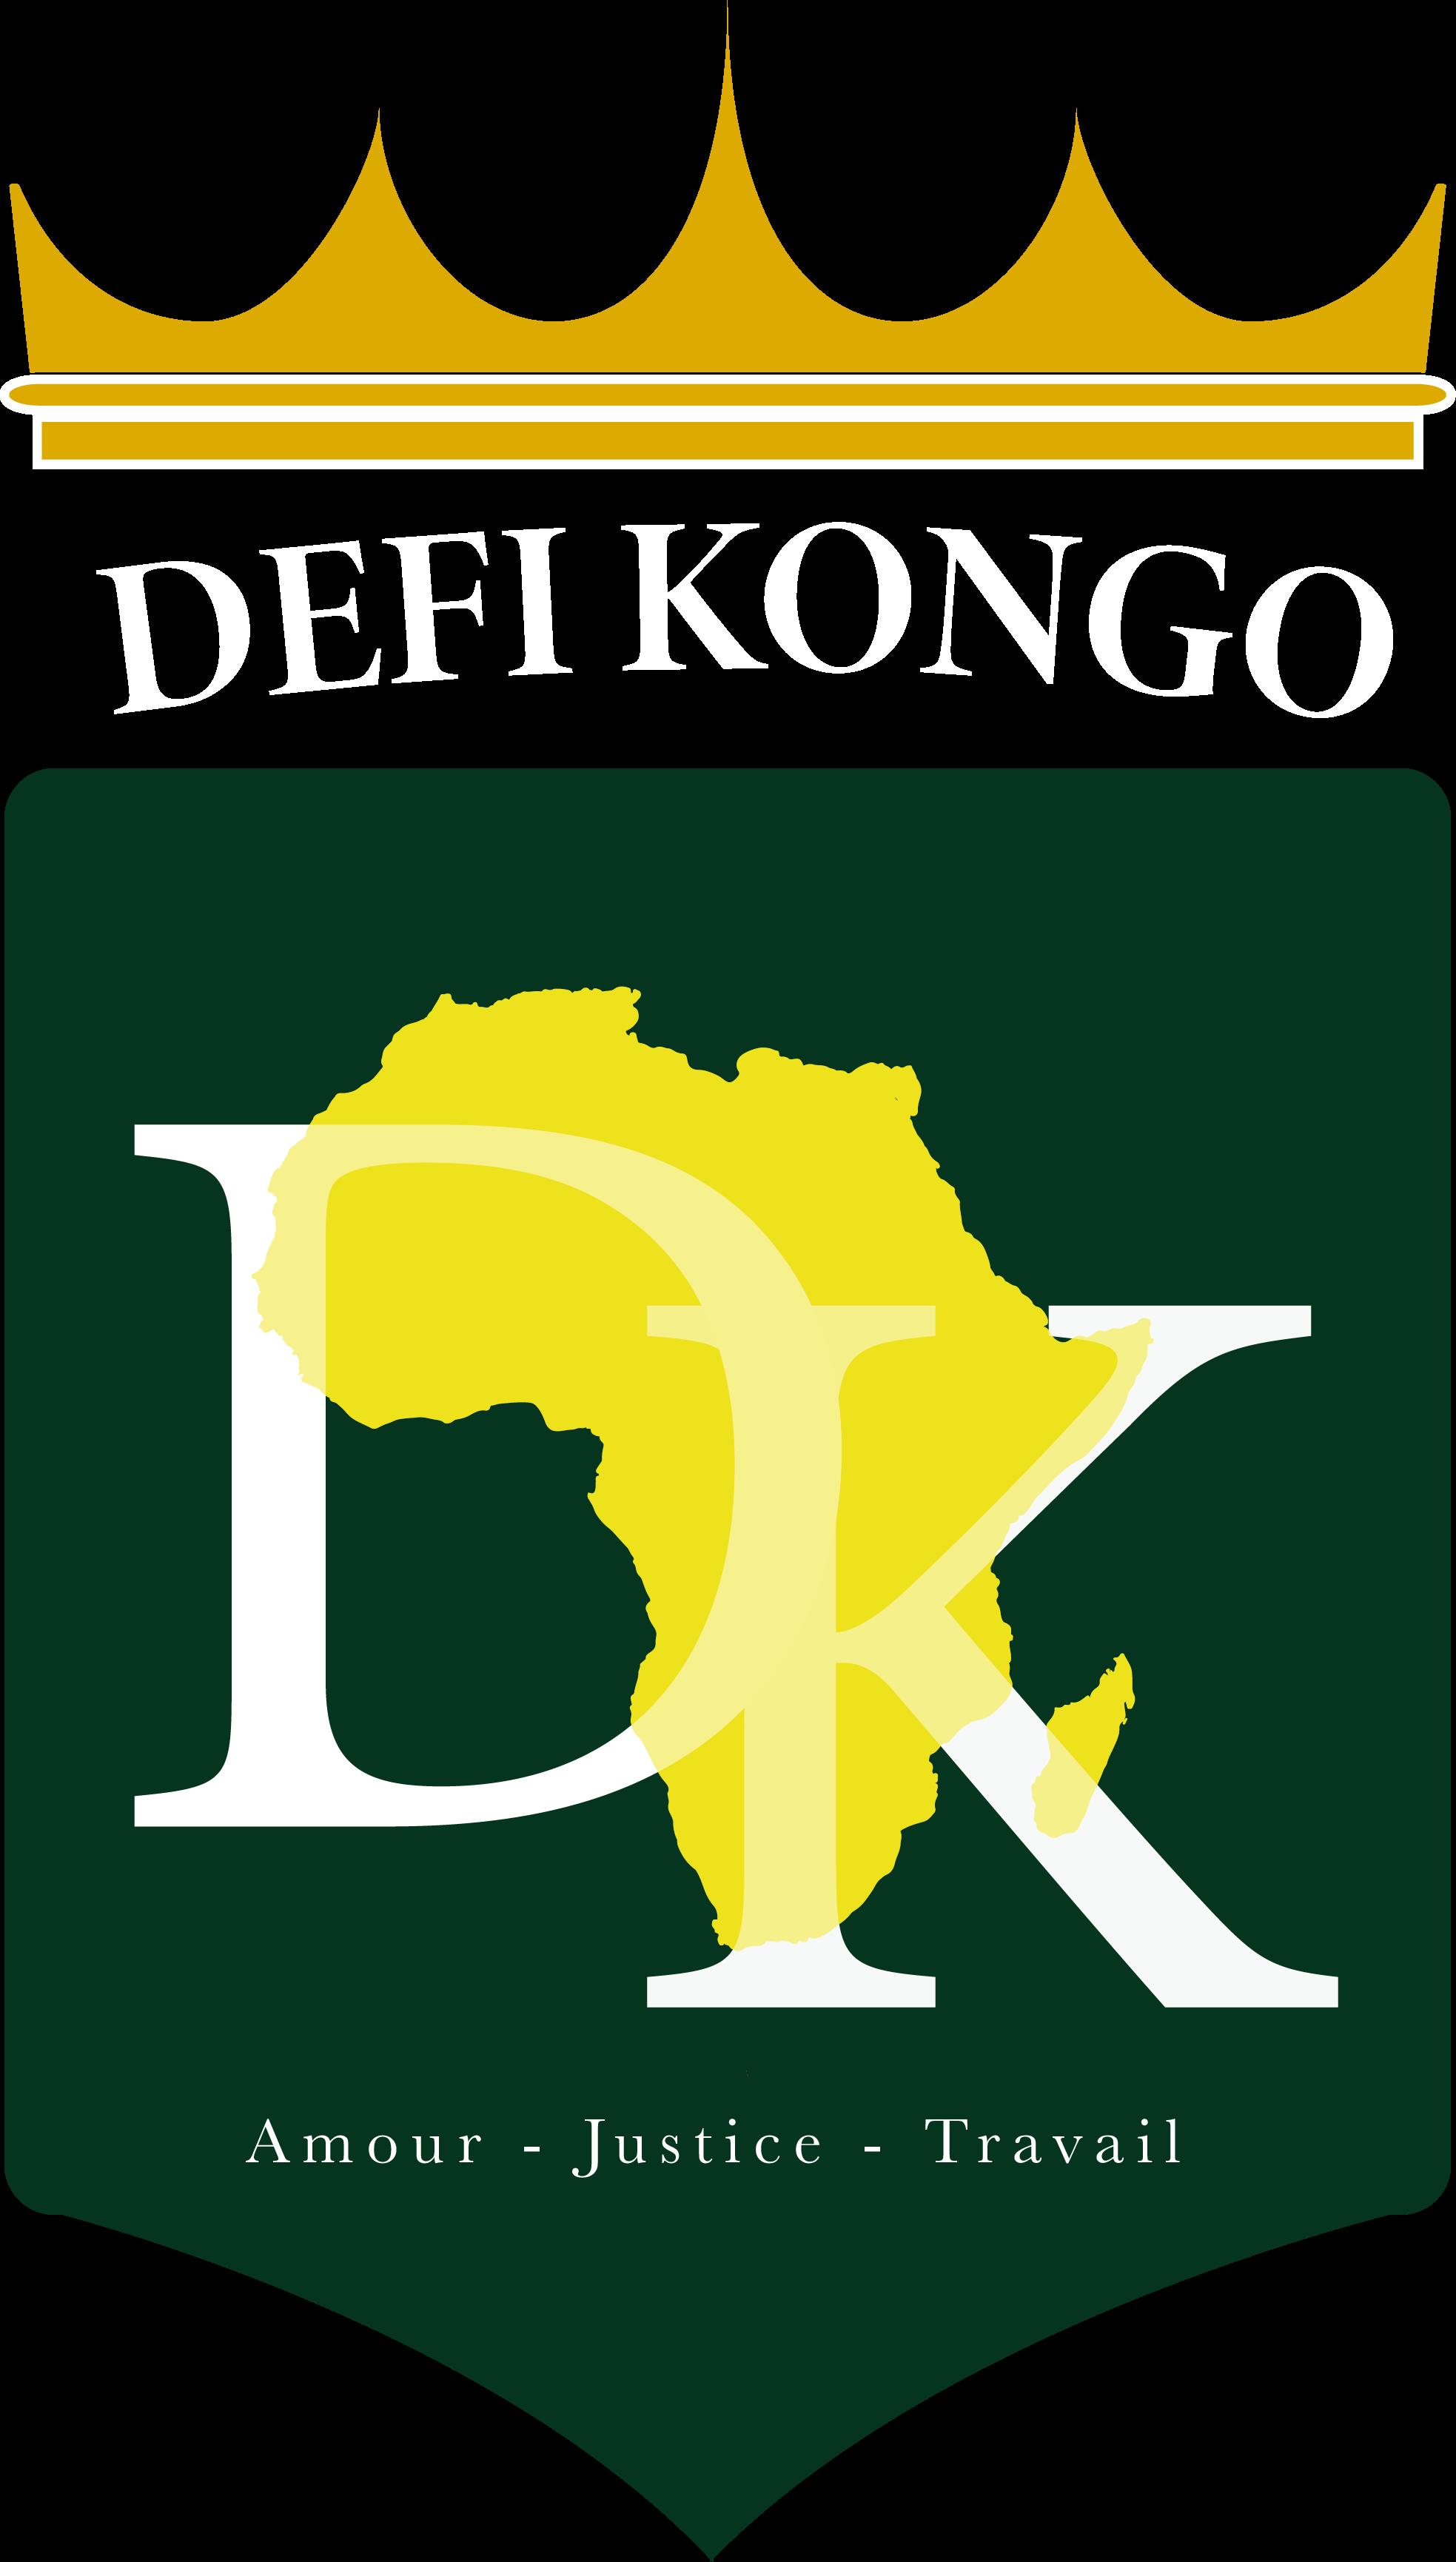 Défi Kongo